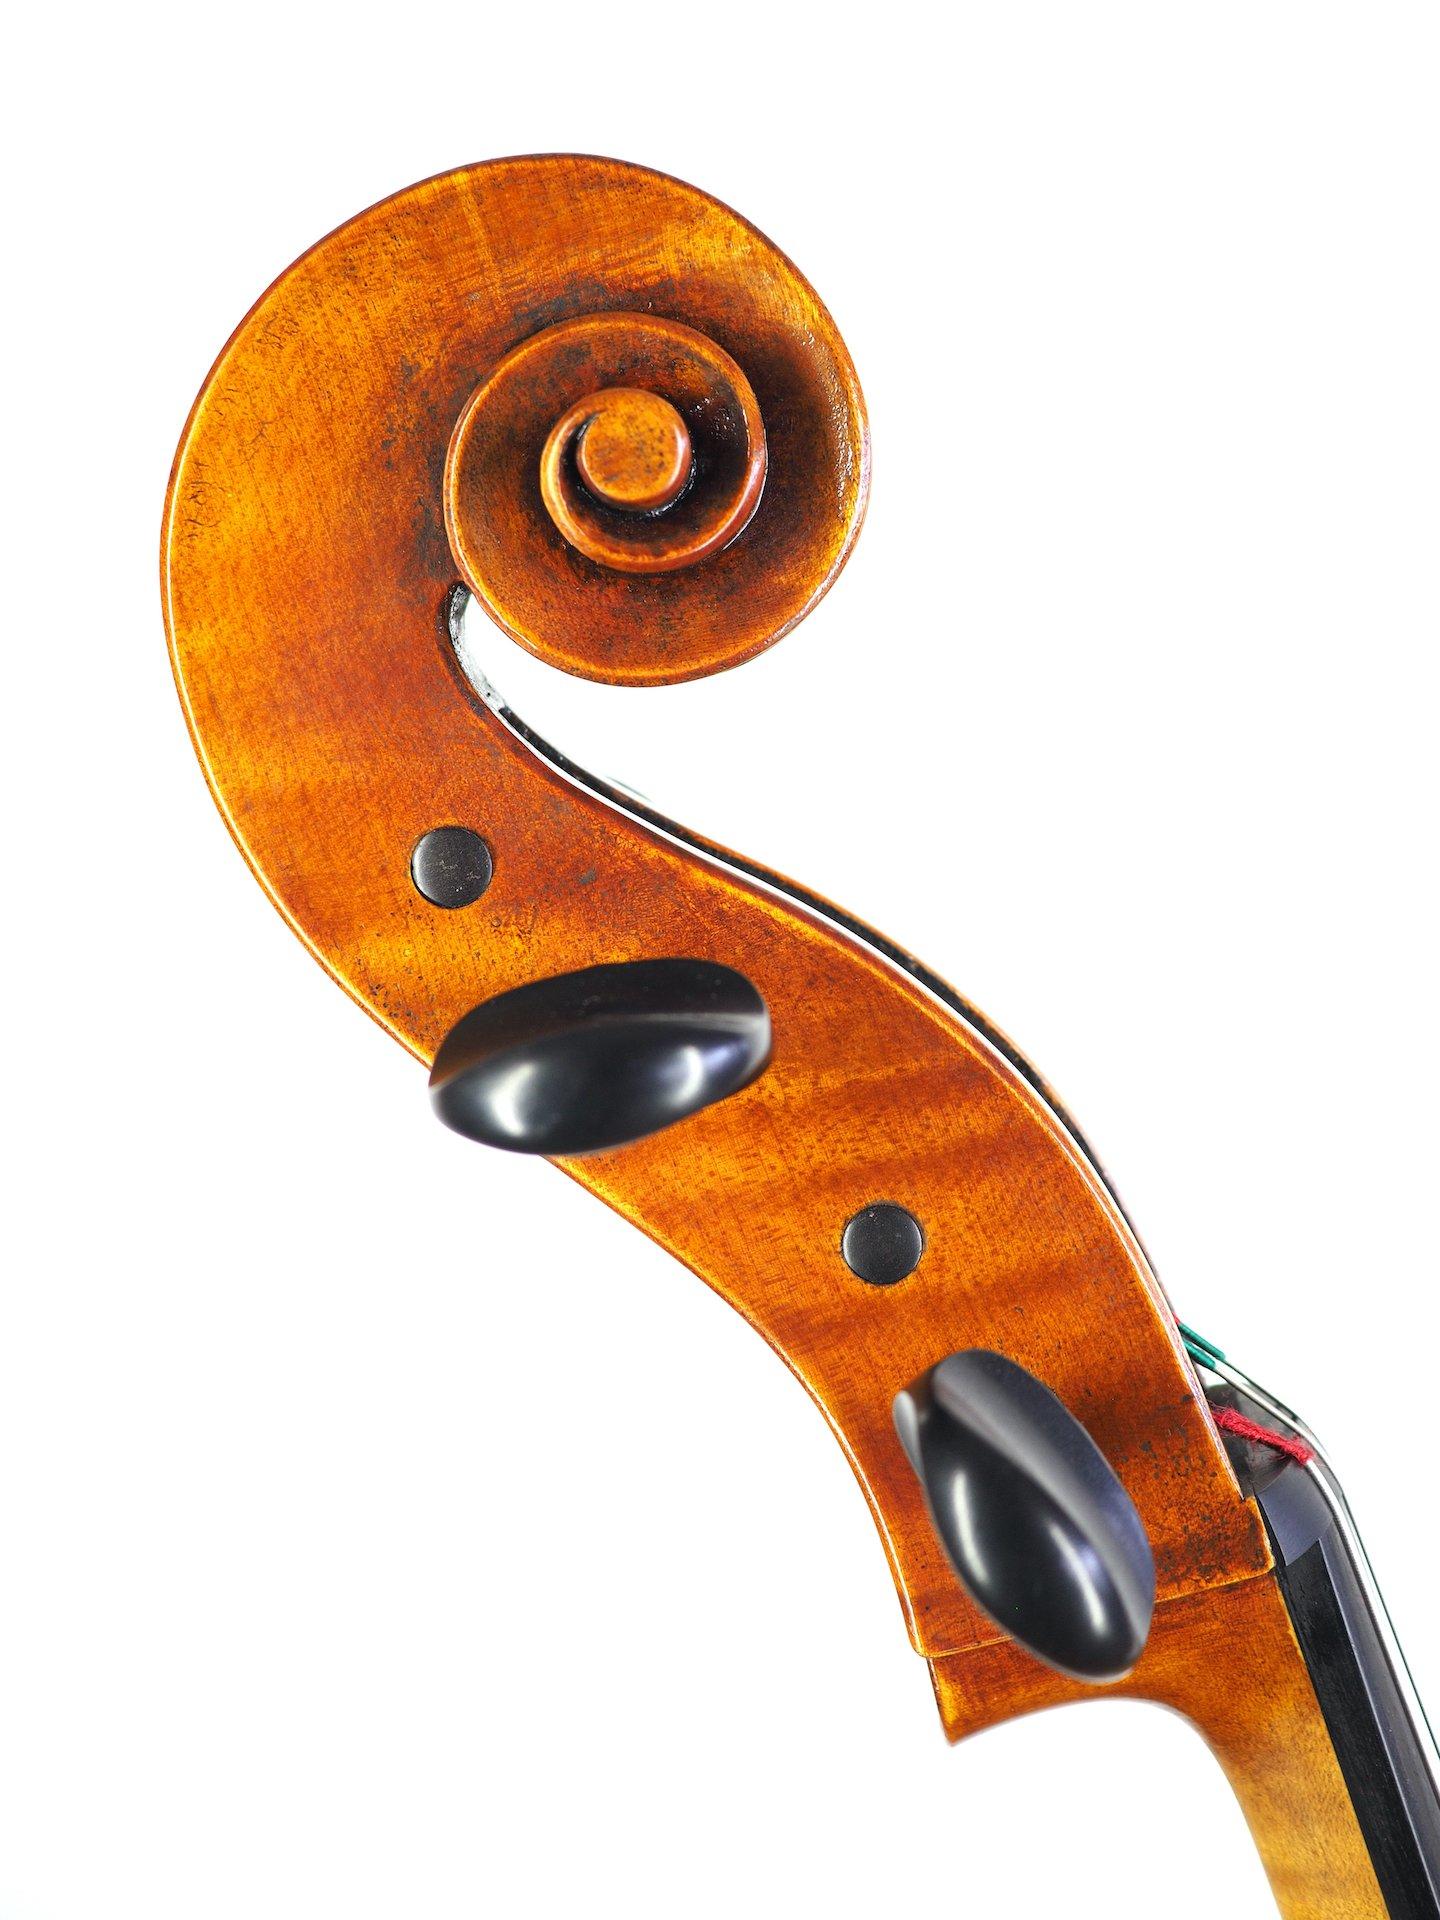 Cello Elisabeth Graml 2021 - Schnecke